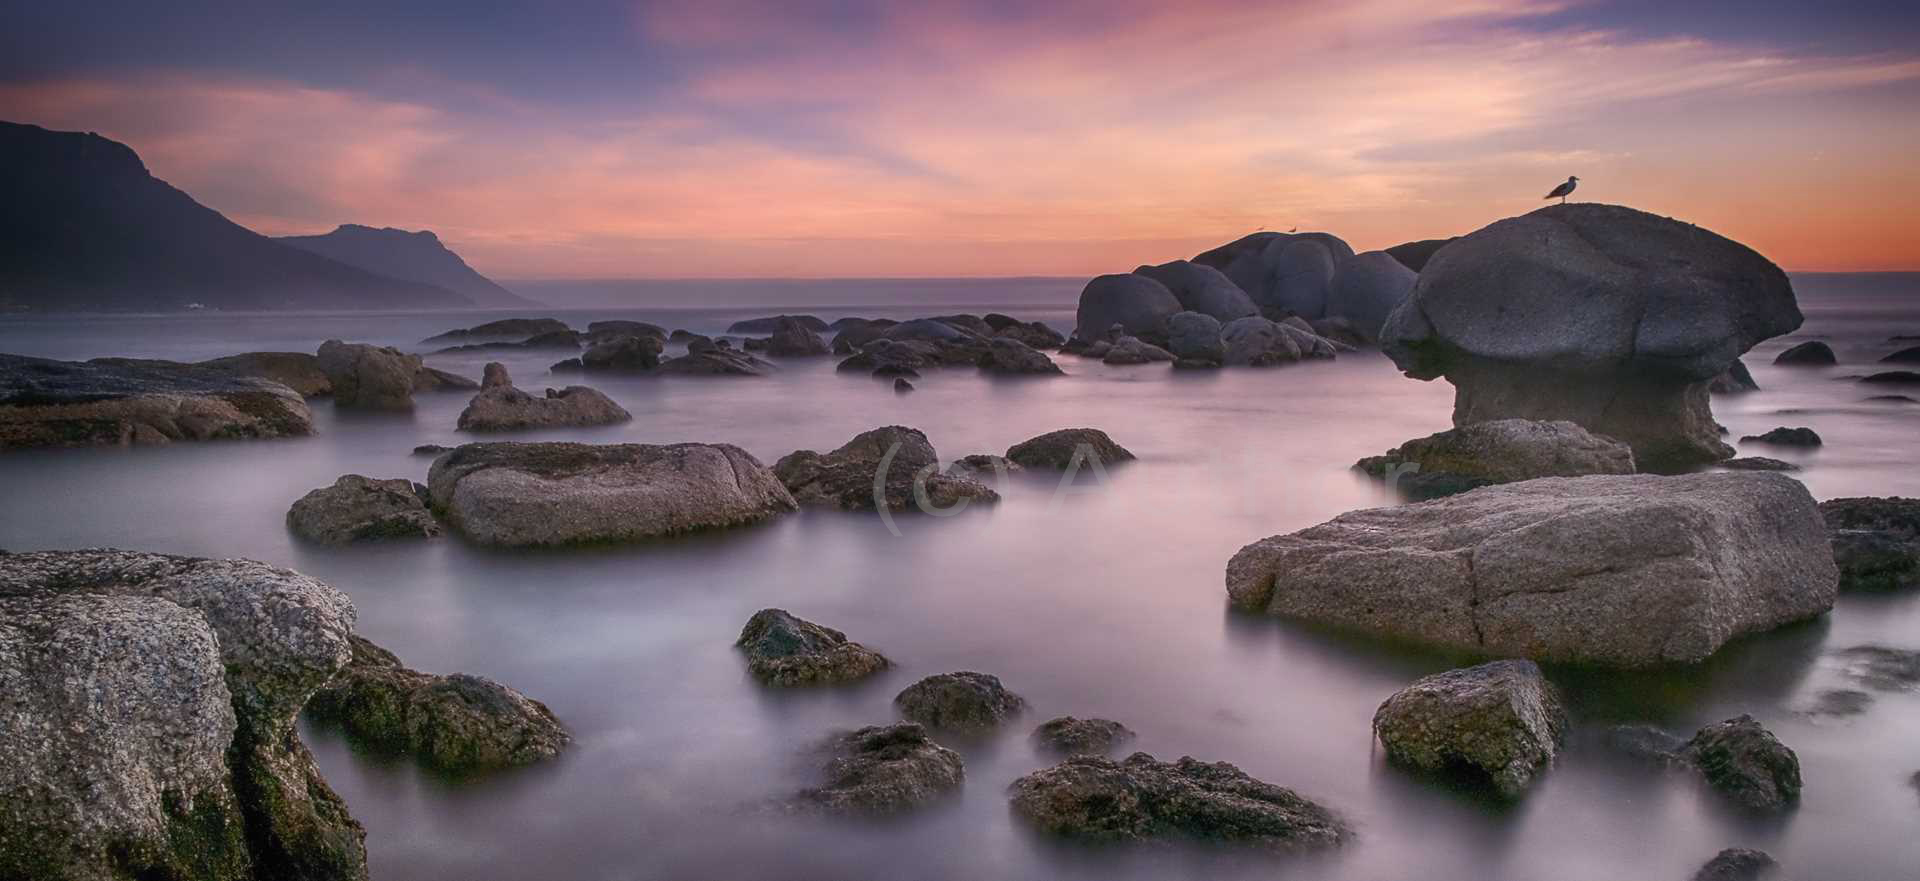 4_NA_Seagull Silhouette_Clare Appleyard